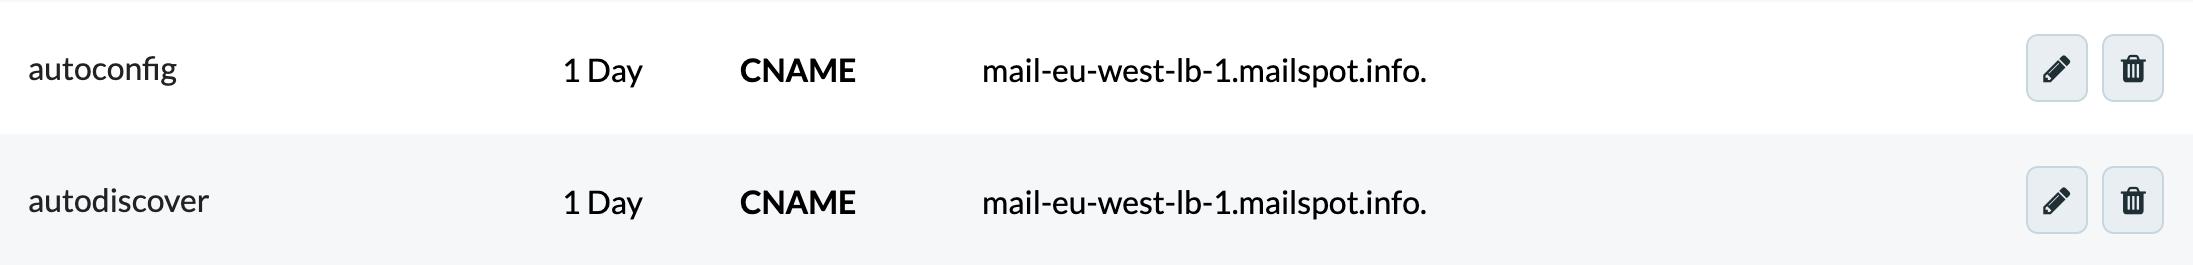 CNAME DNS records